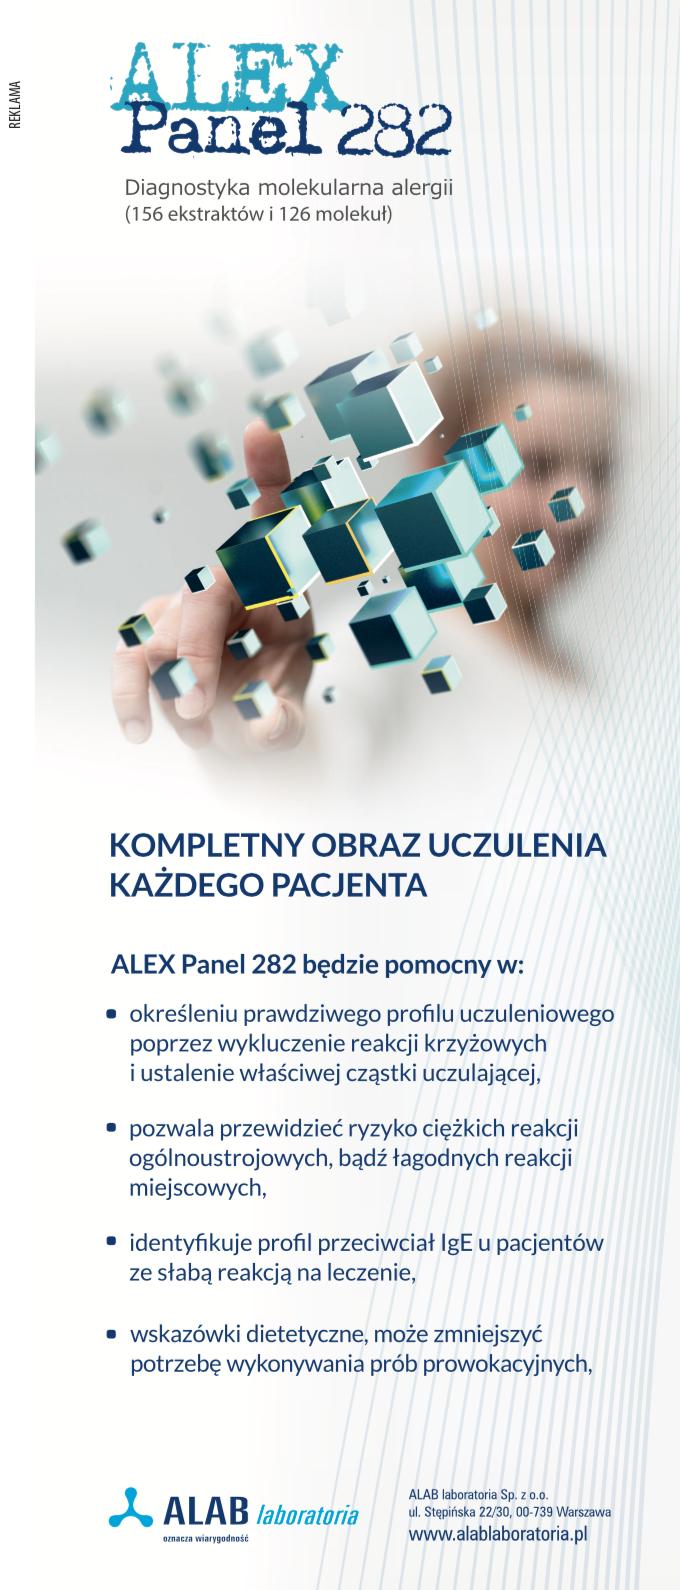 hipoalergiczni-reklama-alab-laboratoria-alex-panel